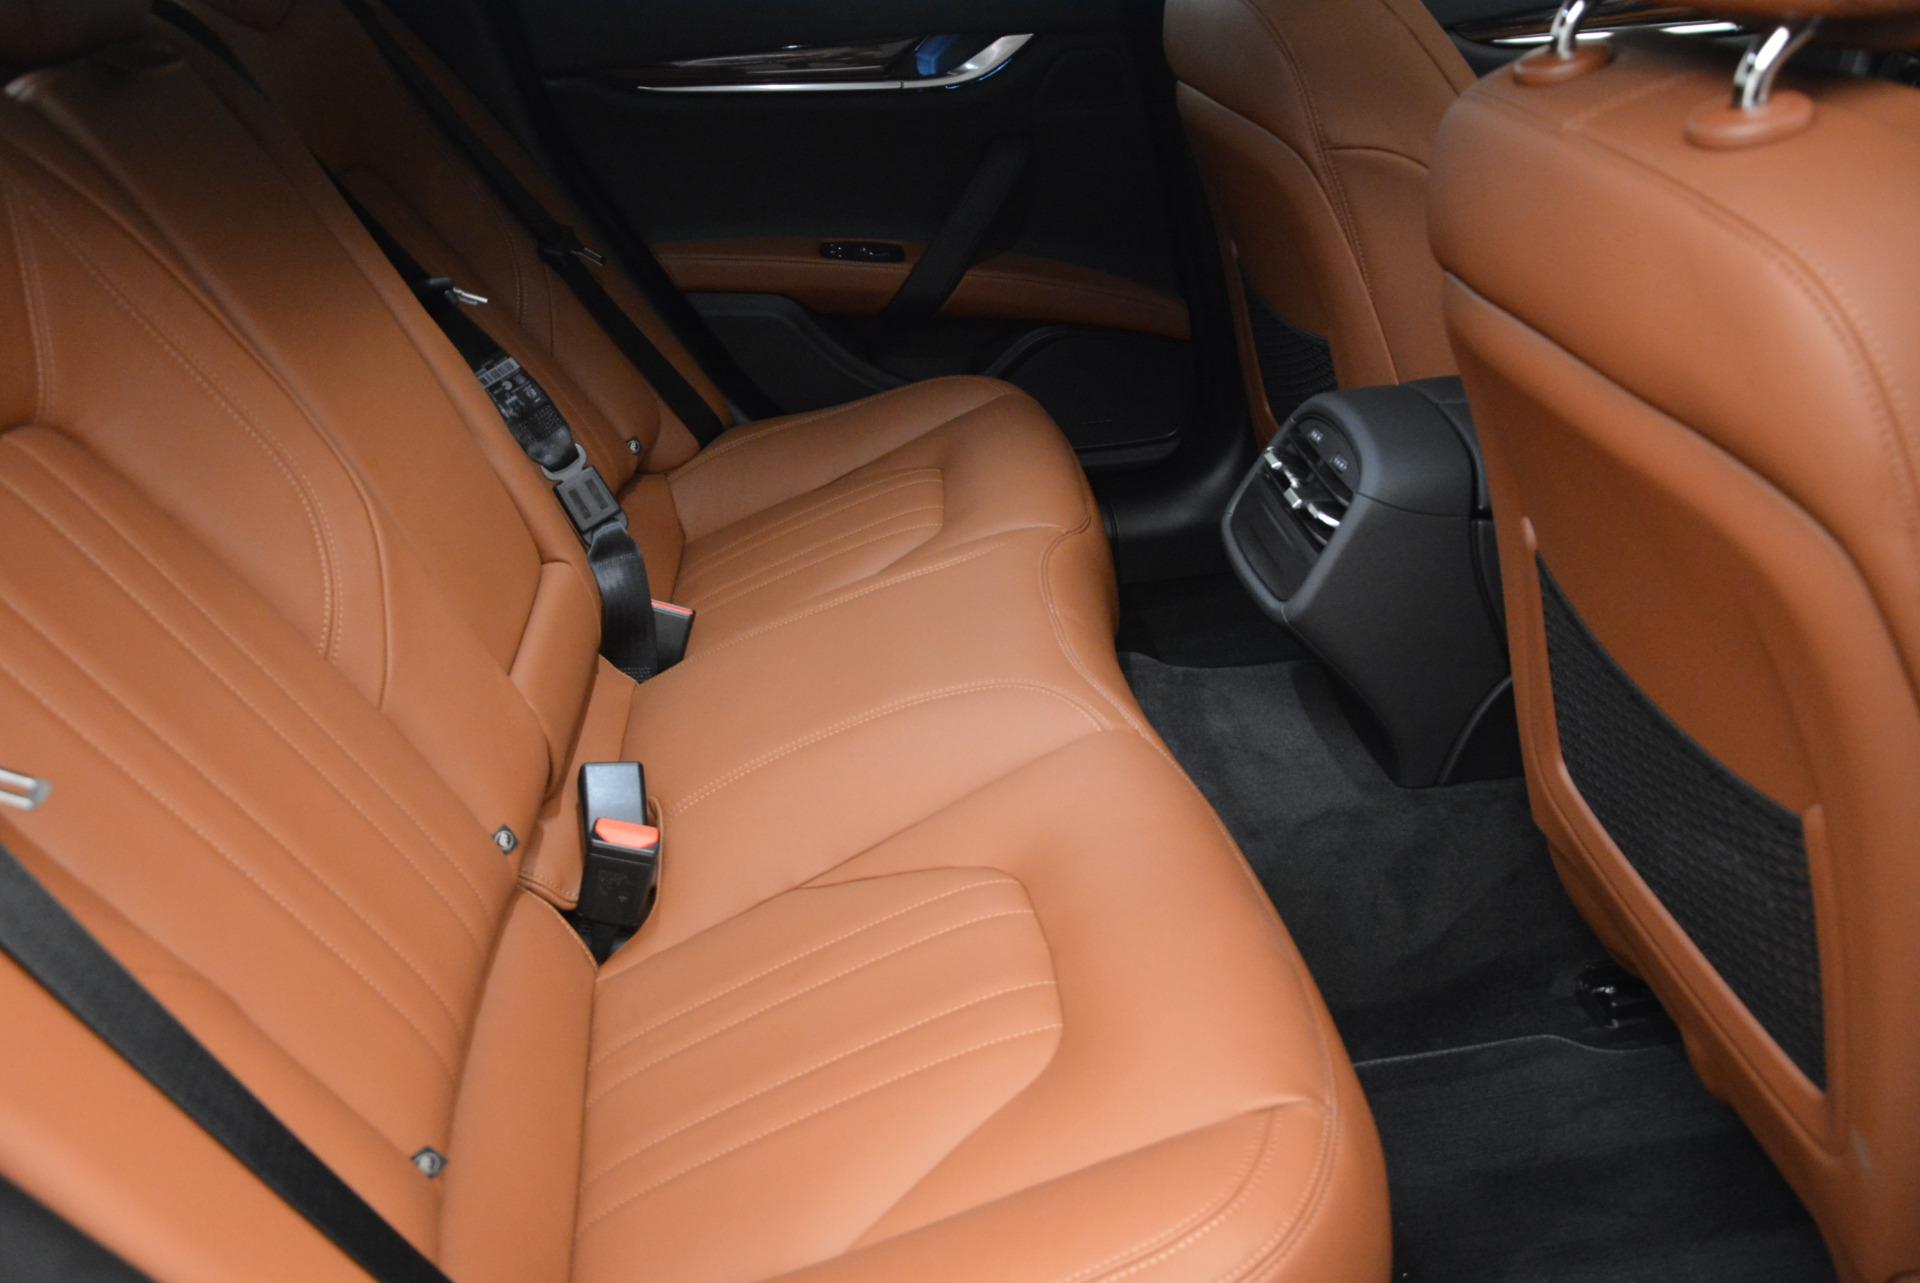 Used 2017 Maserati Ghibli S Q4 - EX Loaner For Sale In Greenwich, CT. Alfa Romeo of Greenwich, M1656 567_p23